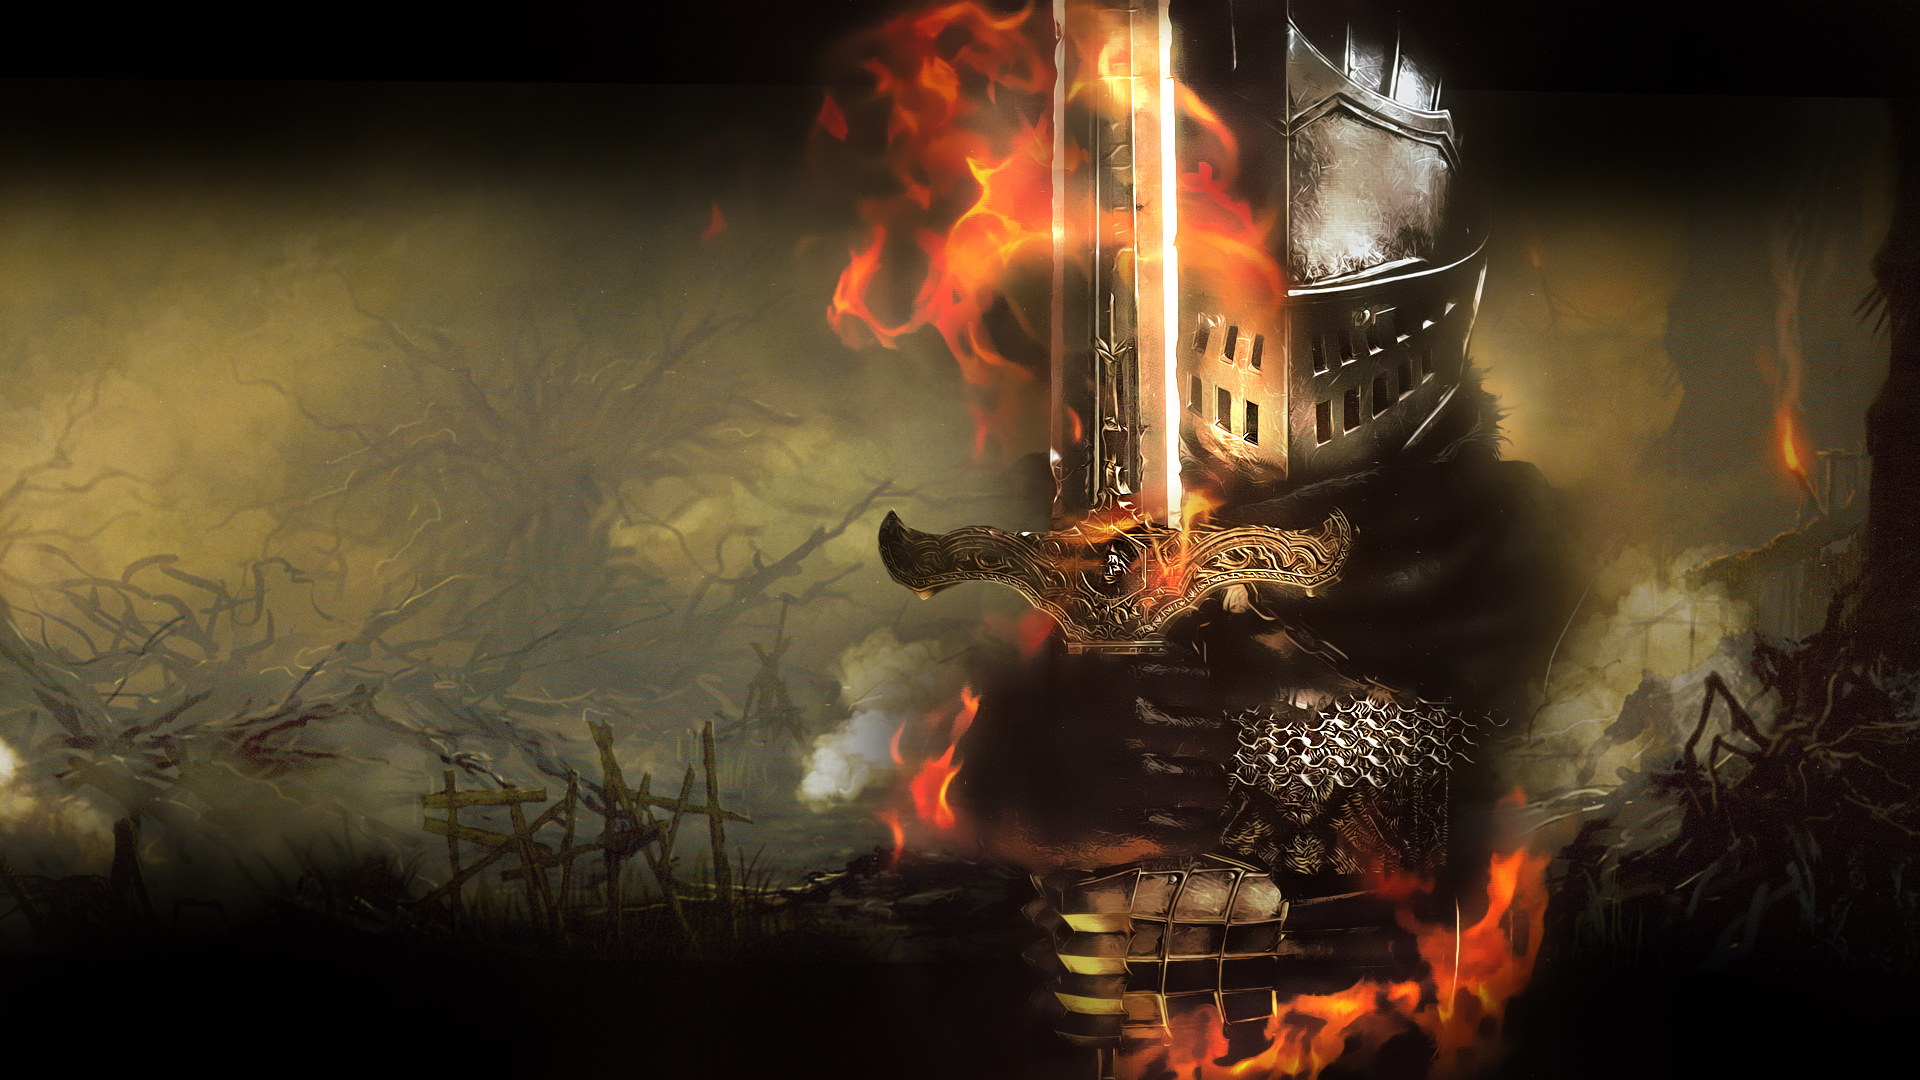 Download Dark Souls Wallpaper 8.0 APK | downloadAPK.net